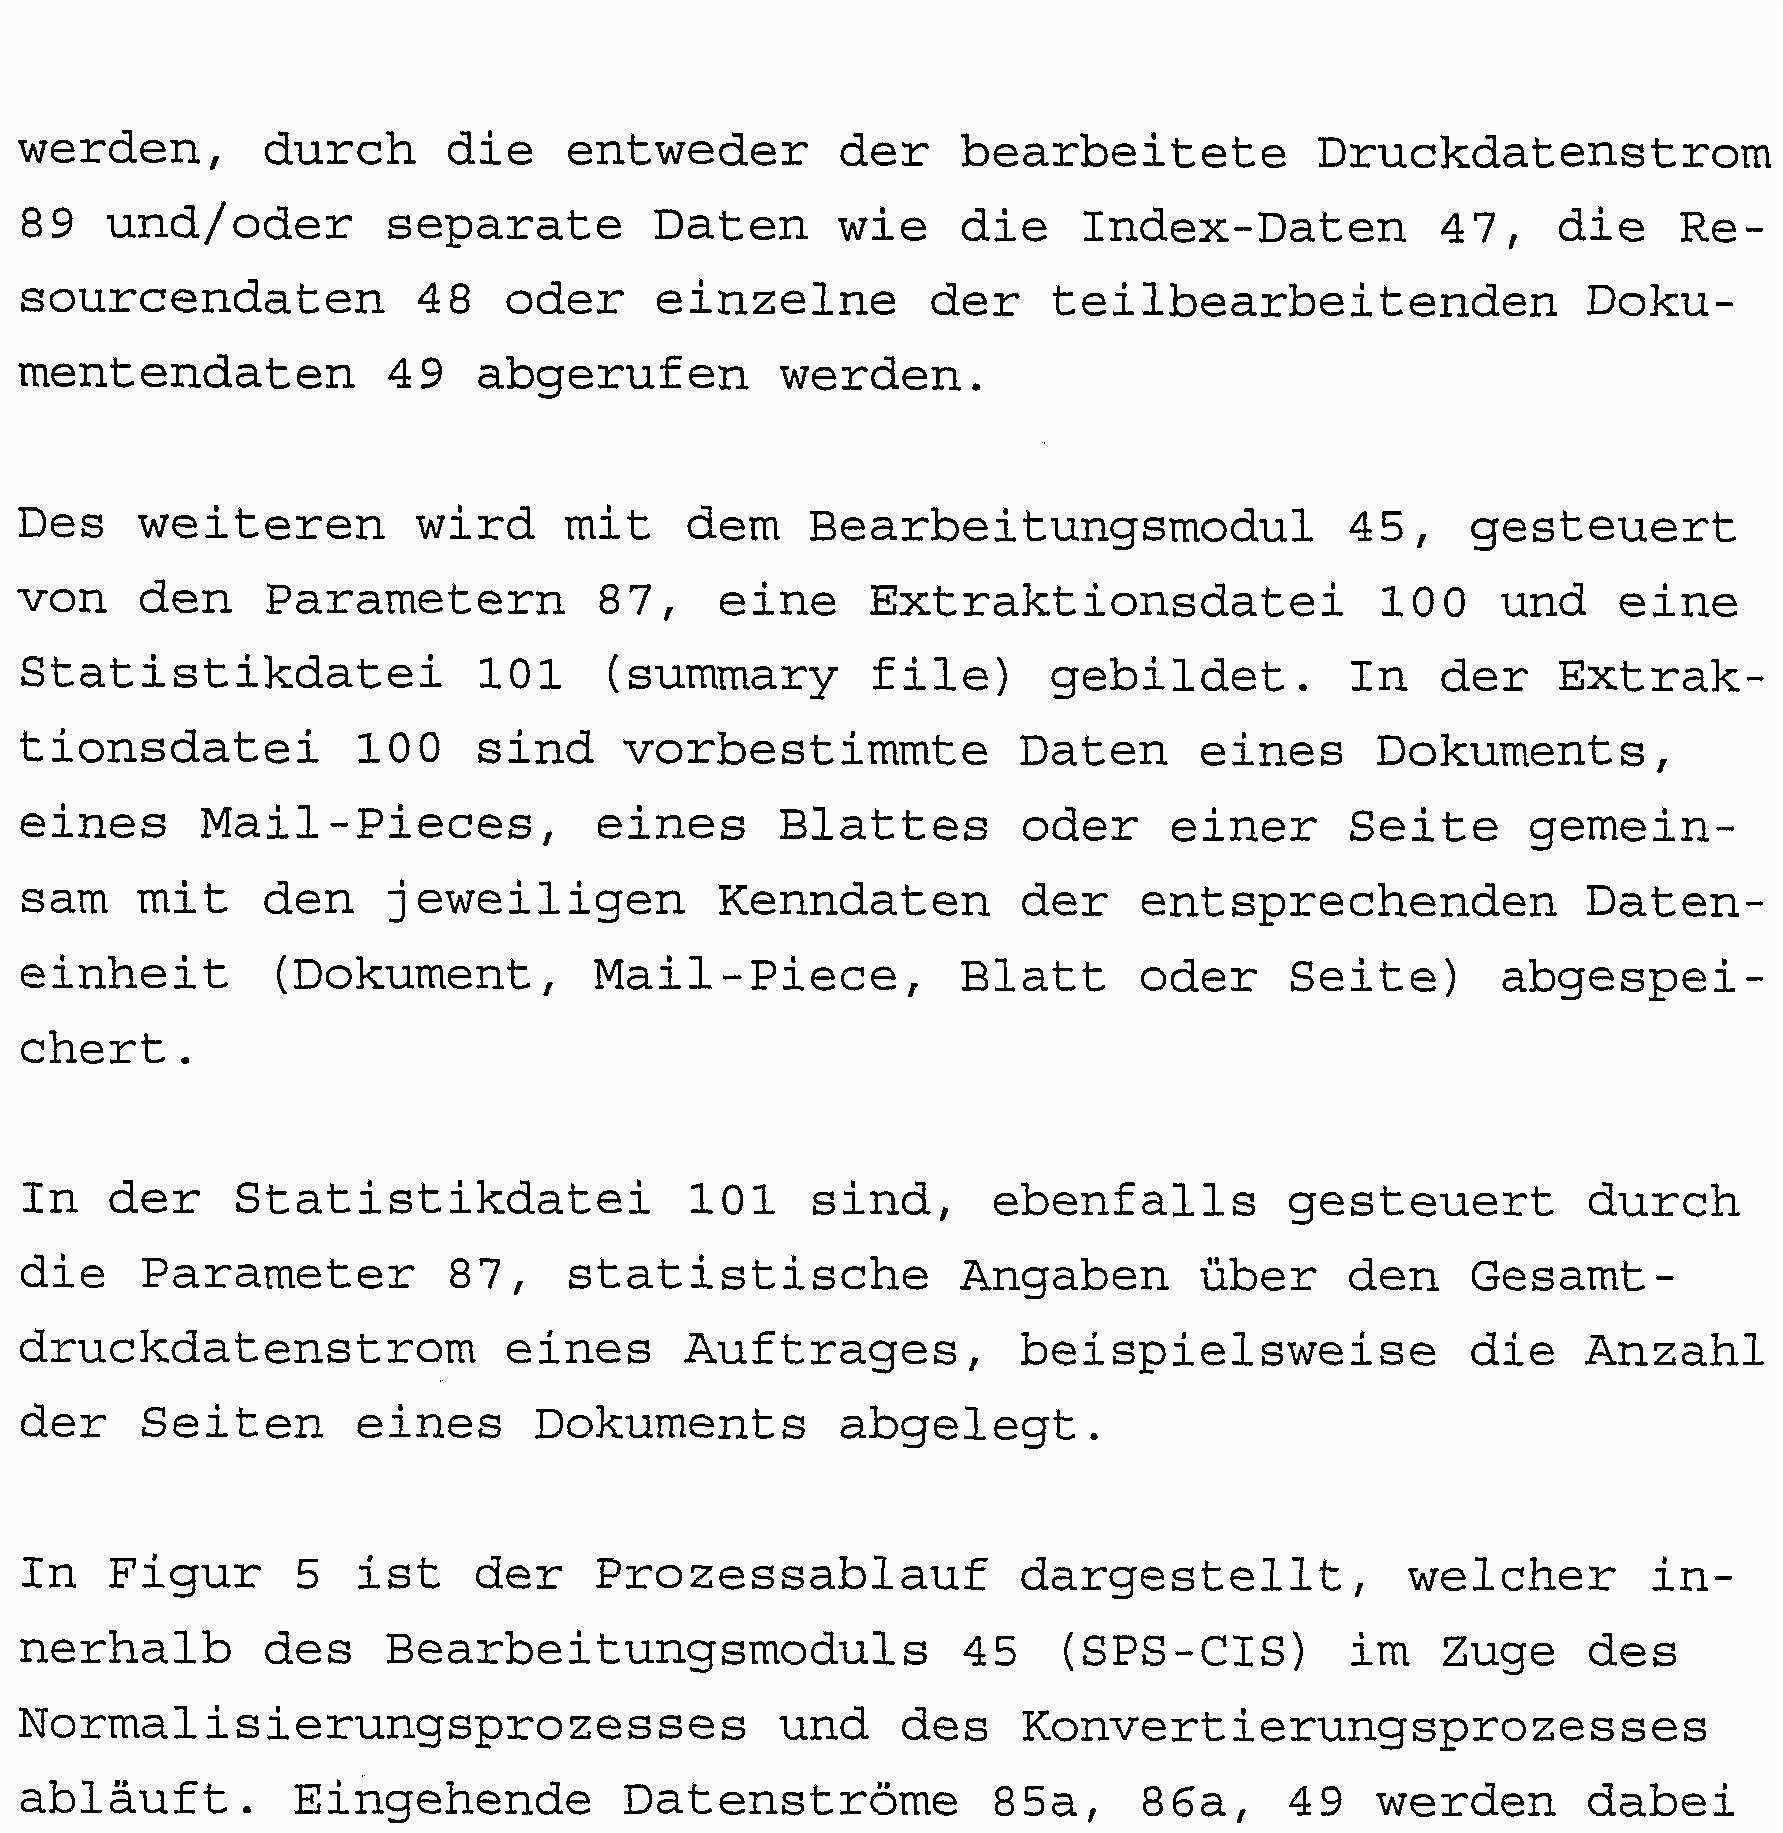 Charmantfrohlich Herma Special Etiketten Vorlage Etiketten Vorlagen Vorlagen Empfehlungsschreiben